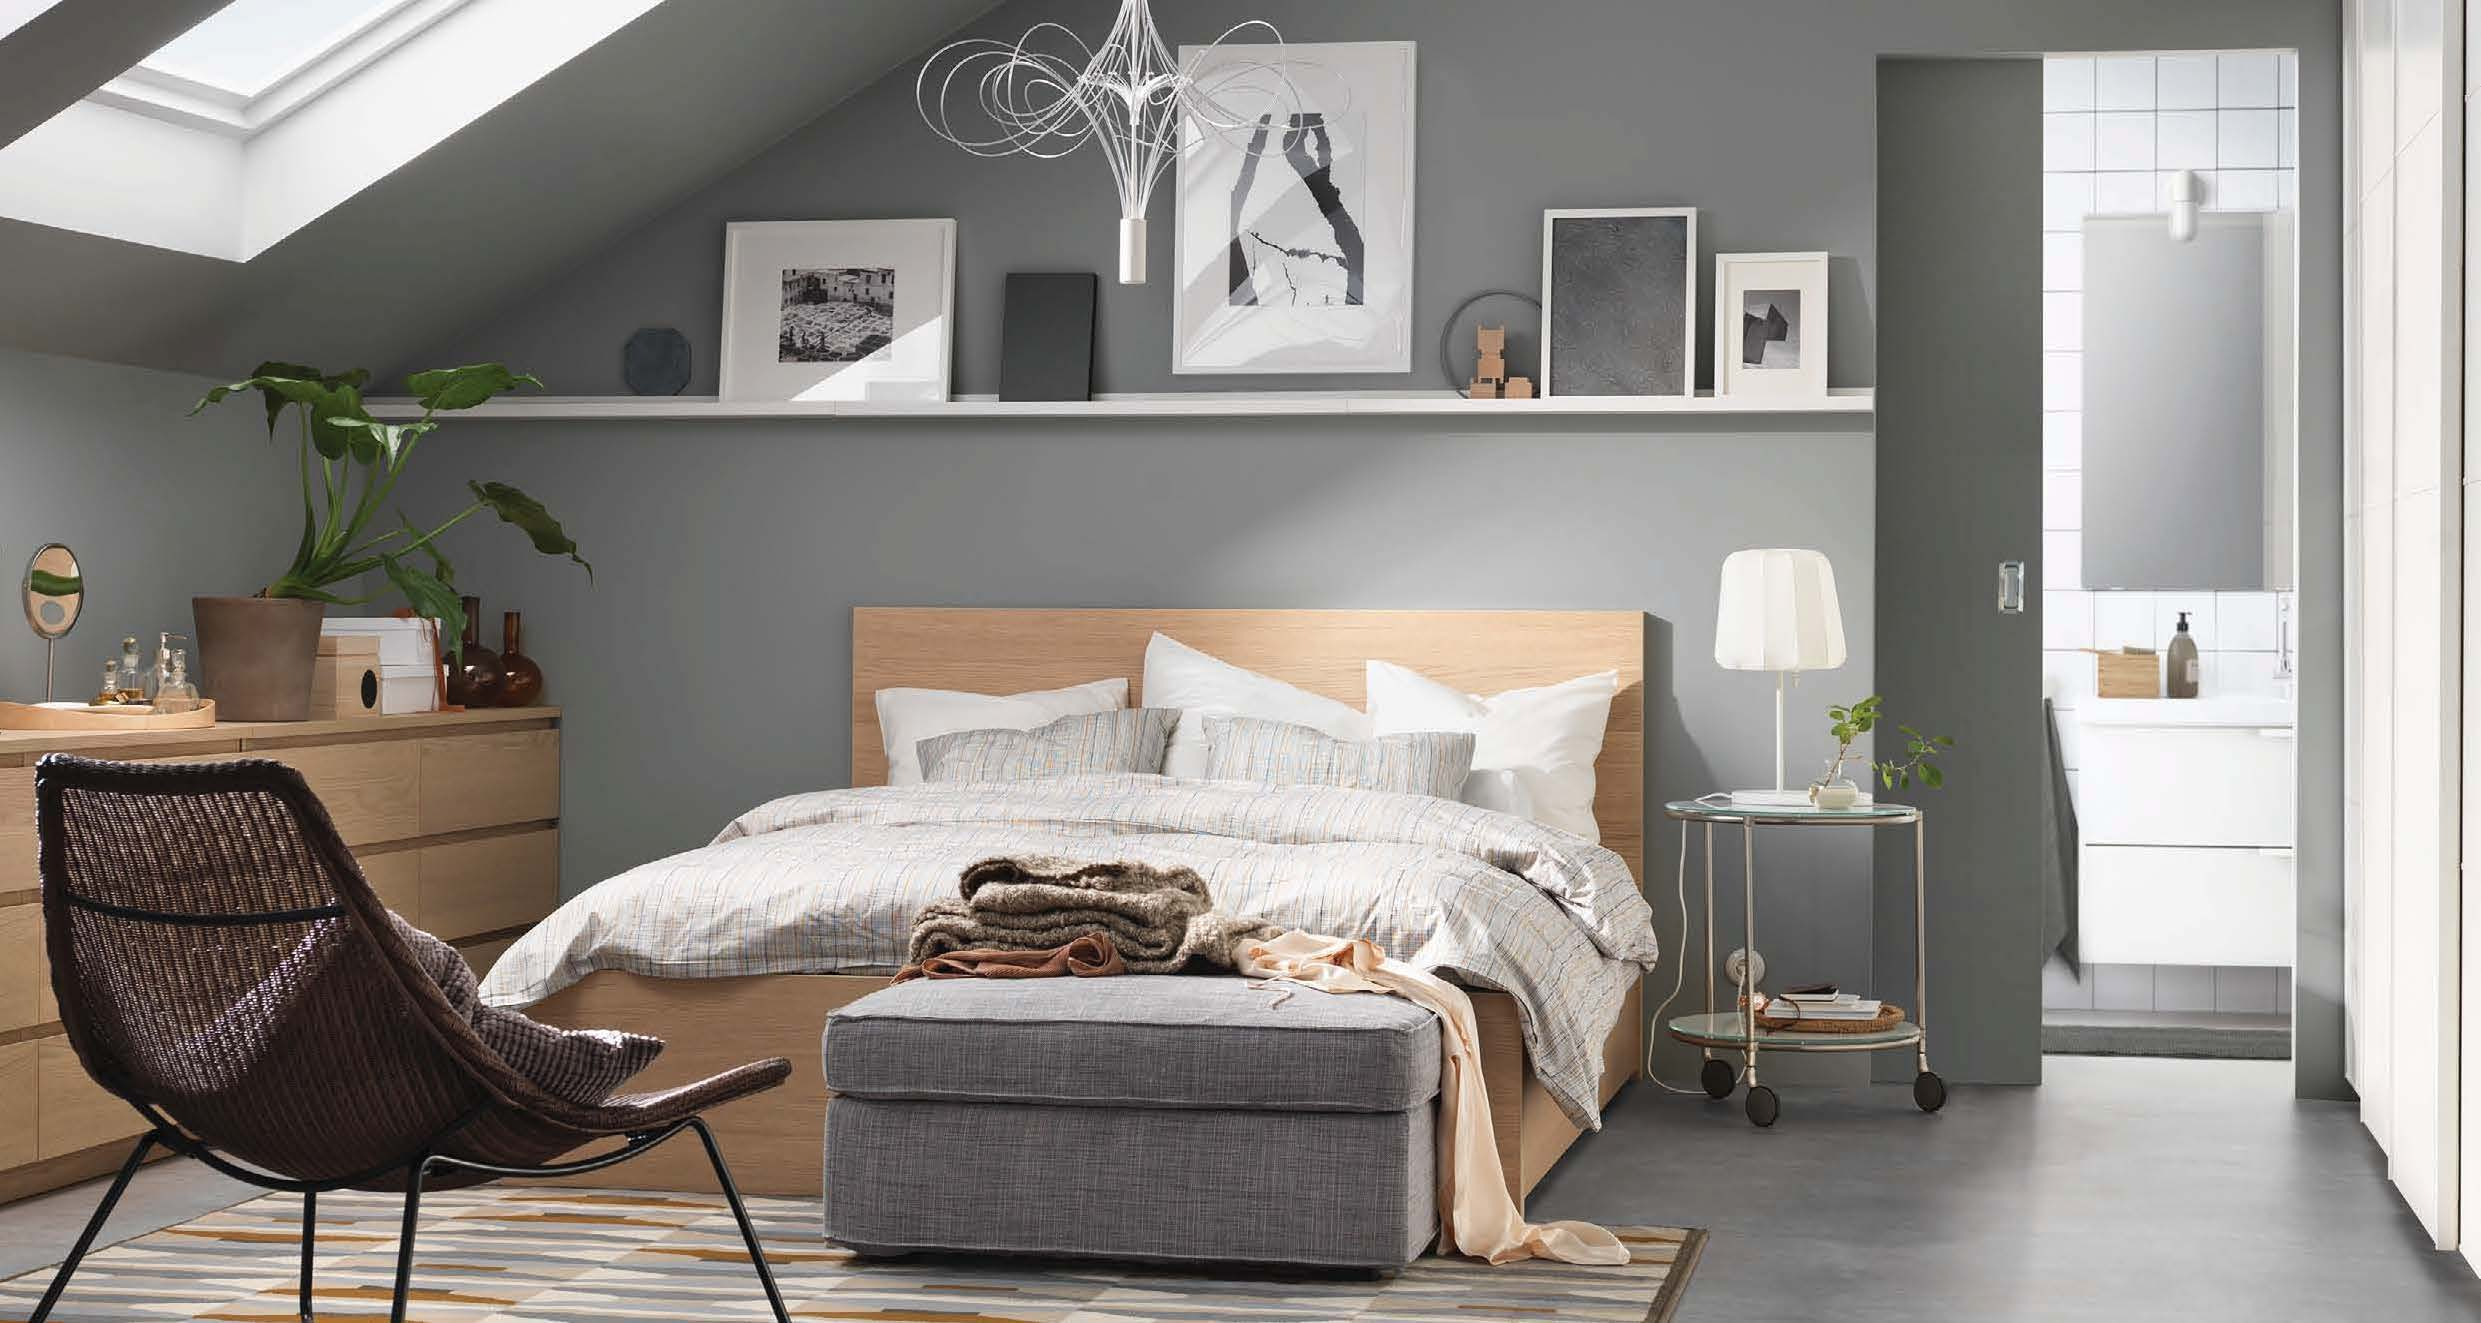 Ikea Bedroom Makeover: IKEA 2016 Catalog